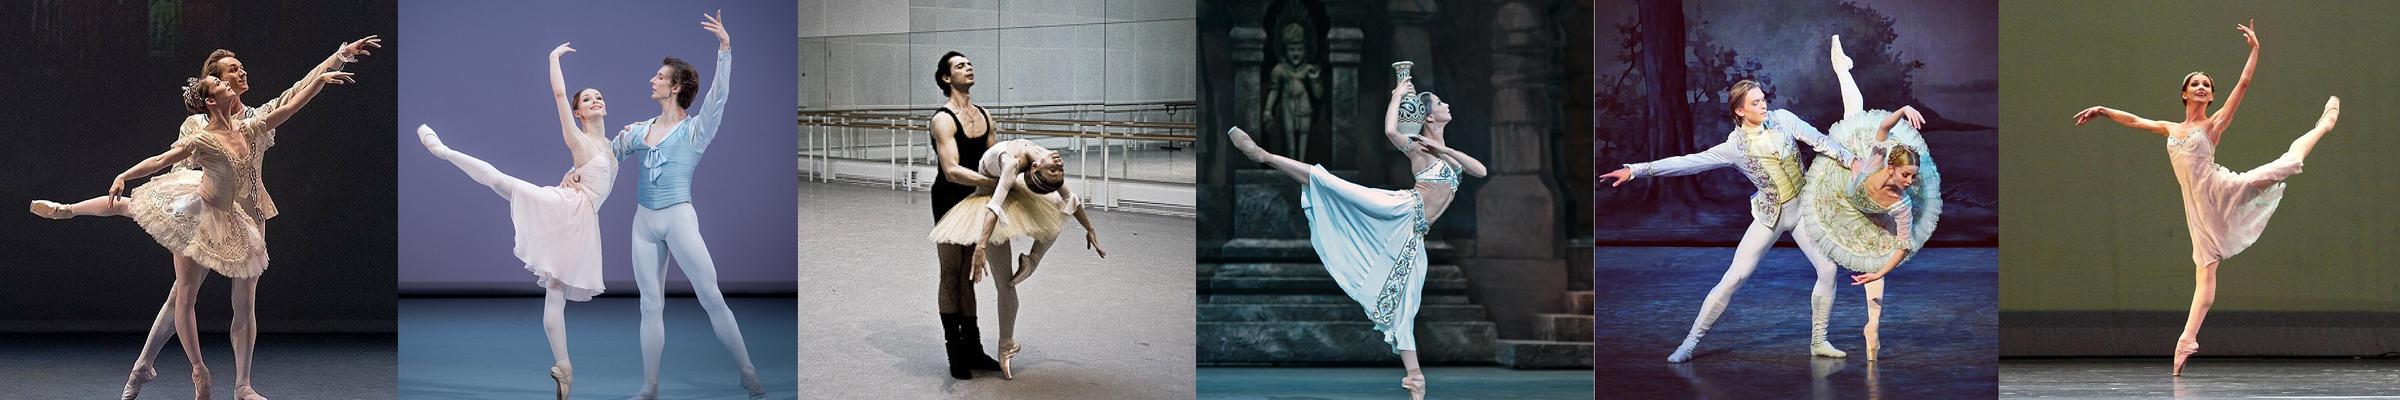 Evgenia Obraztsova Patron, Melbourne Academy of the Arts